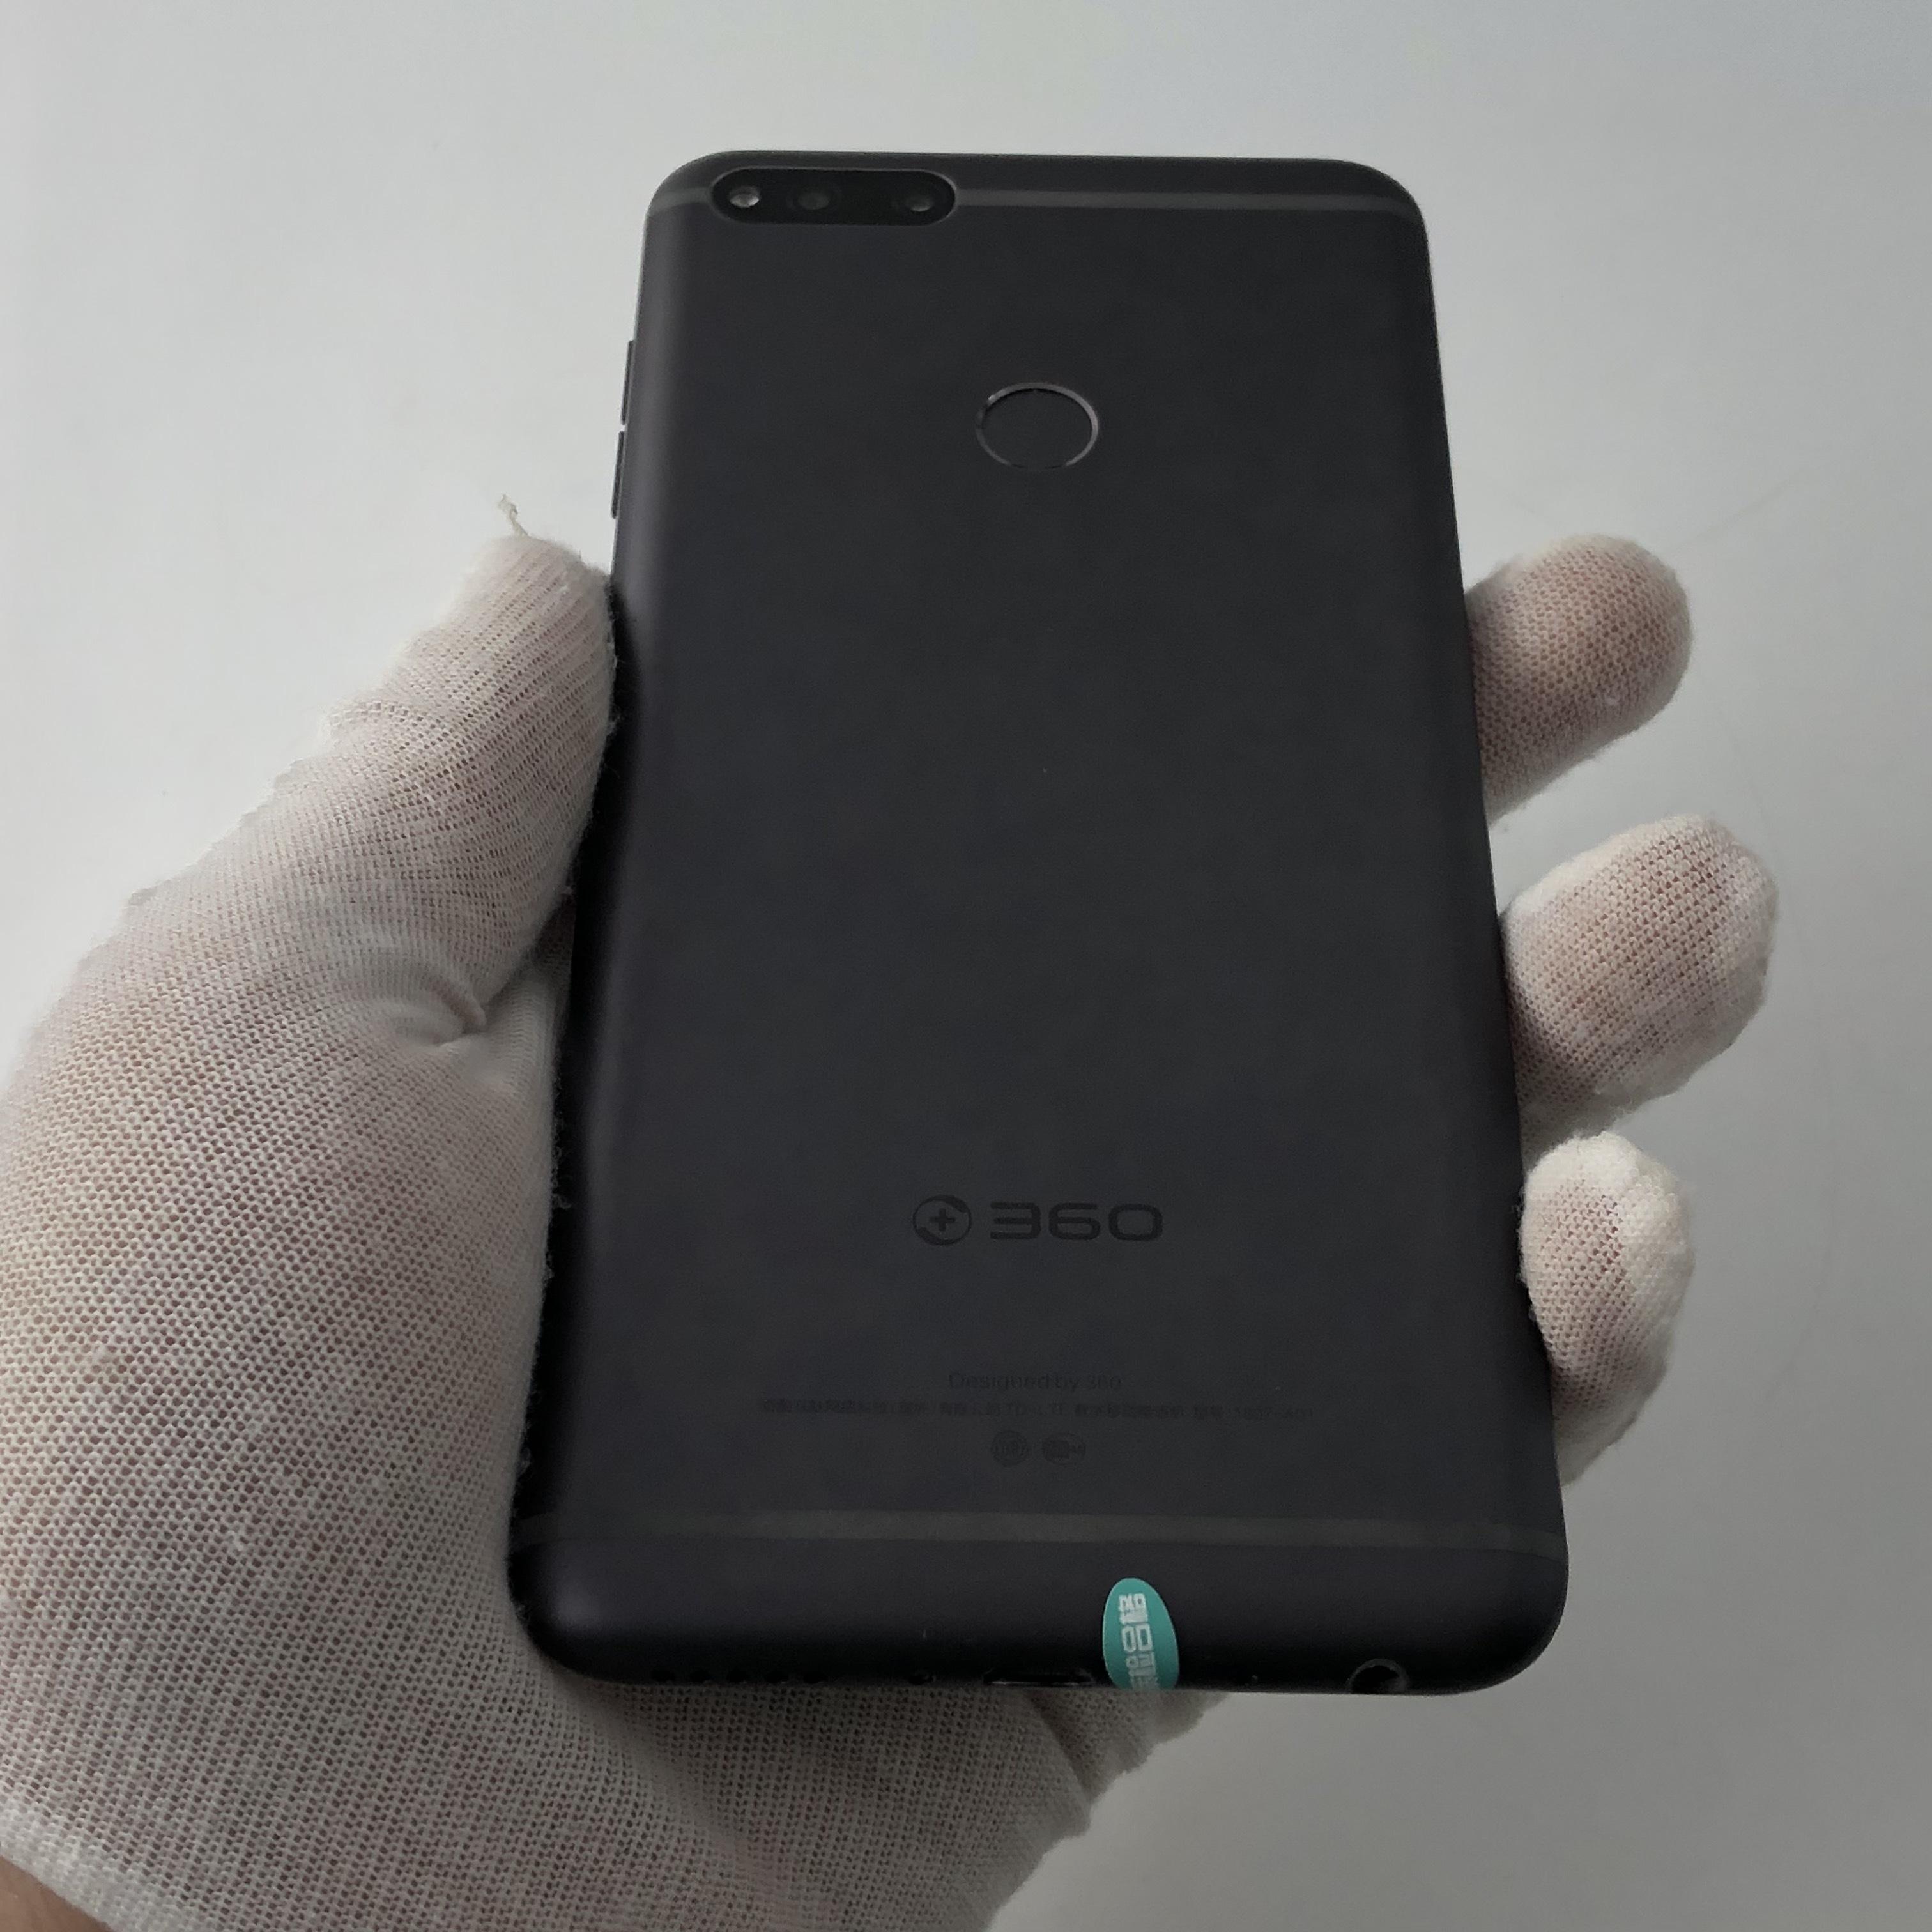 360手机【N7】4G全网通 黑色 6G/64G 国行 95新